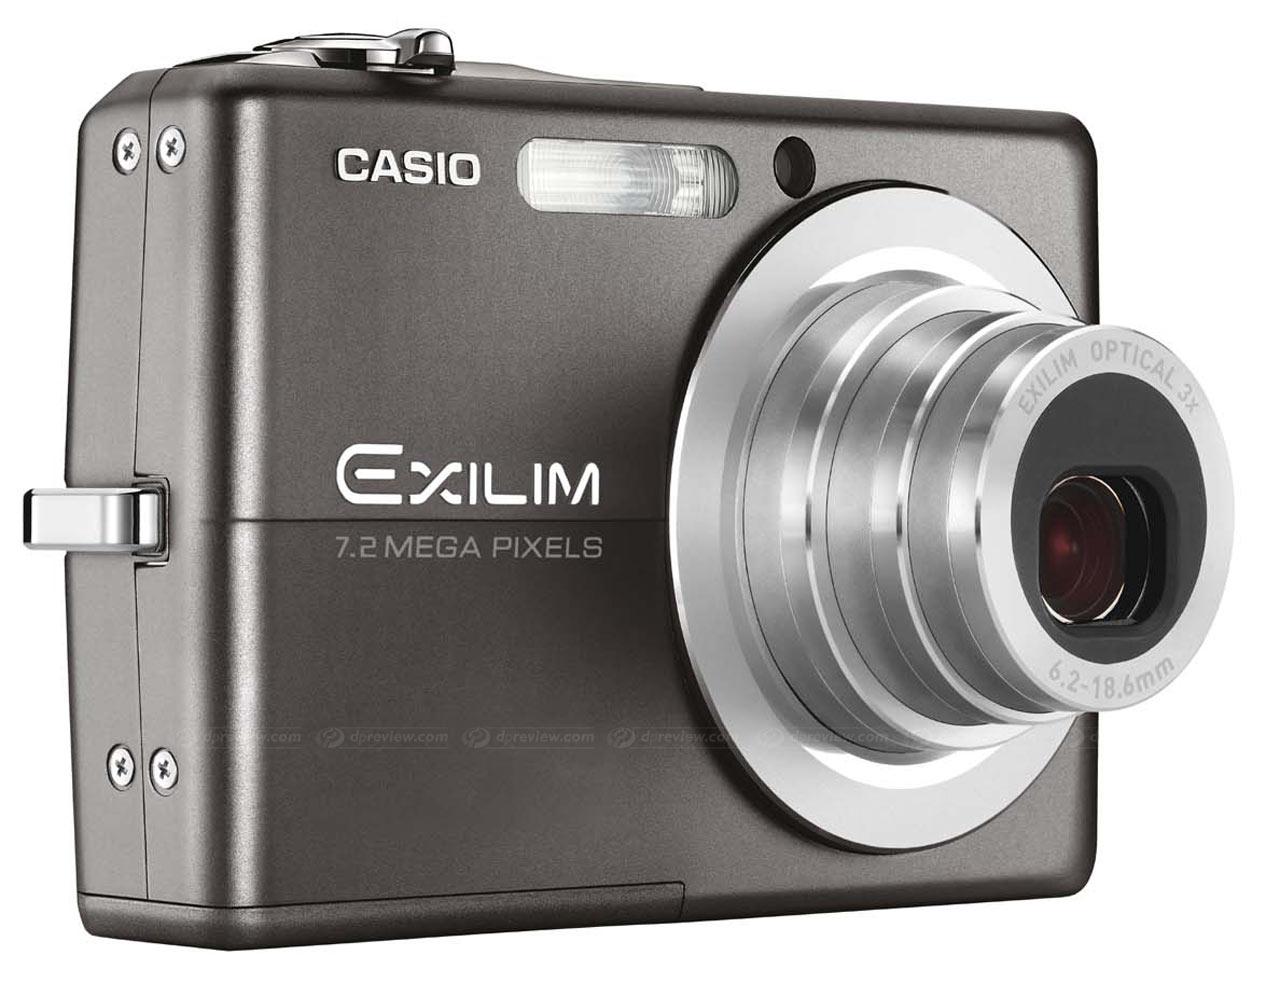 casio exilim zoom ex z700 digital photography review rh dpreview com Casio HD Instruction LG Octane Manual